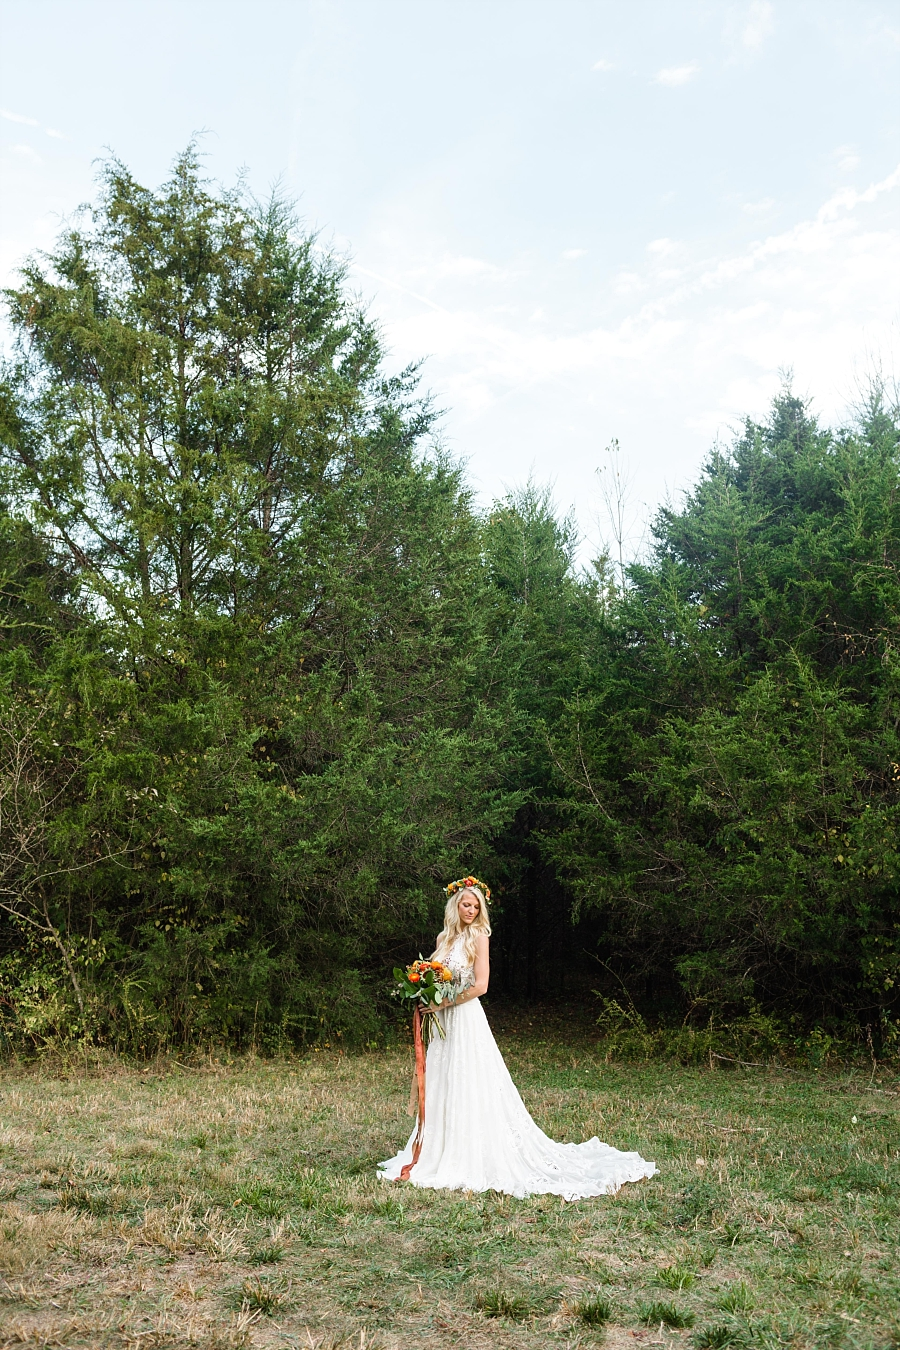 Stacy-Anderson-Photography-Cedarwood-Weddings-Nashville-Destination-Wedding-Photographer_0044.jpg